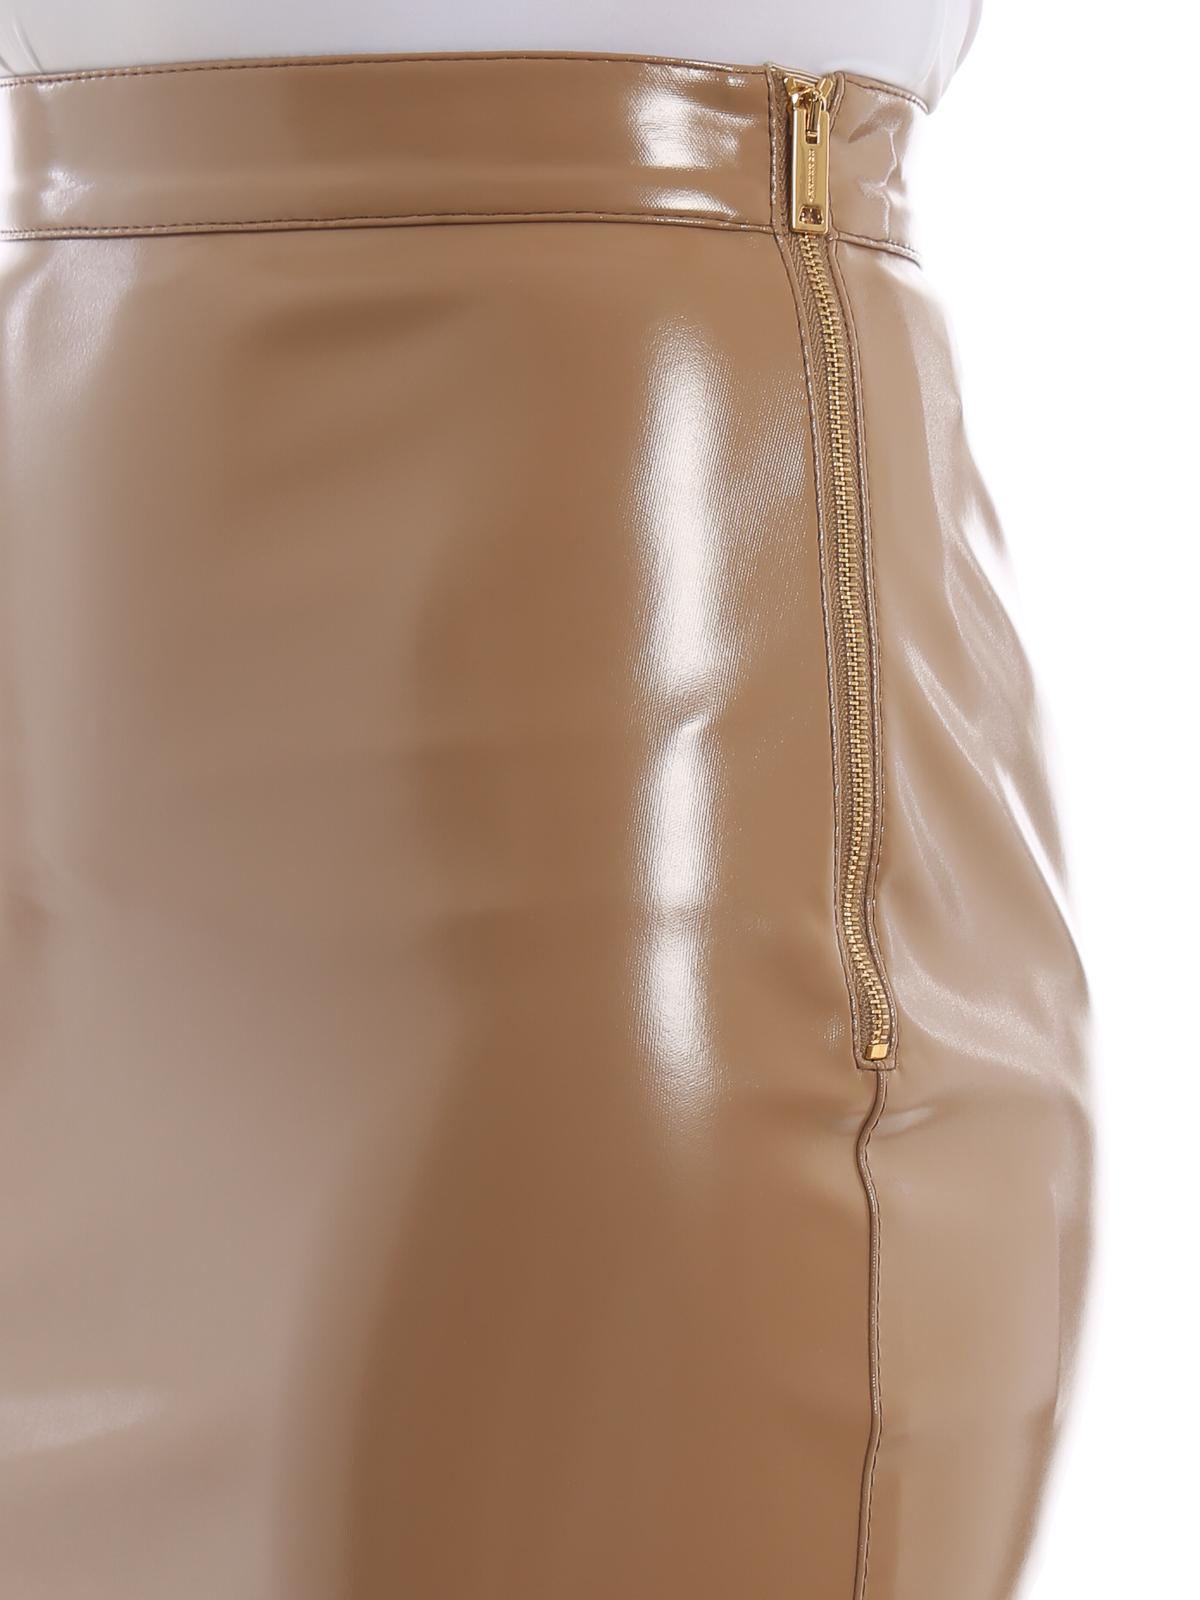 361cc8f14 Burberry - Vinyl pencil skirt - Knee length skirts & Midi - 4560878